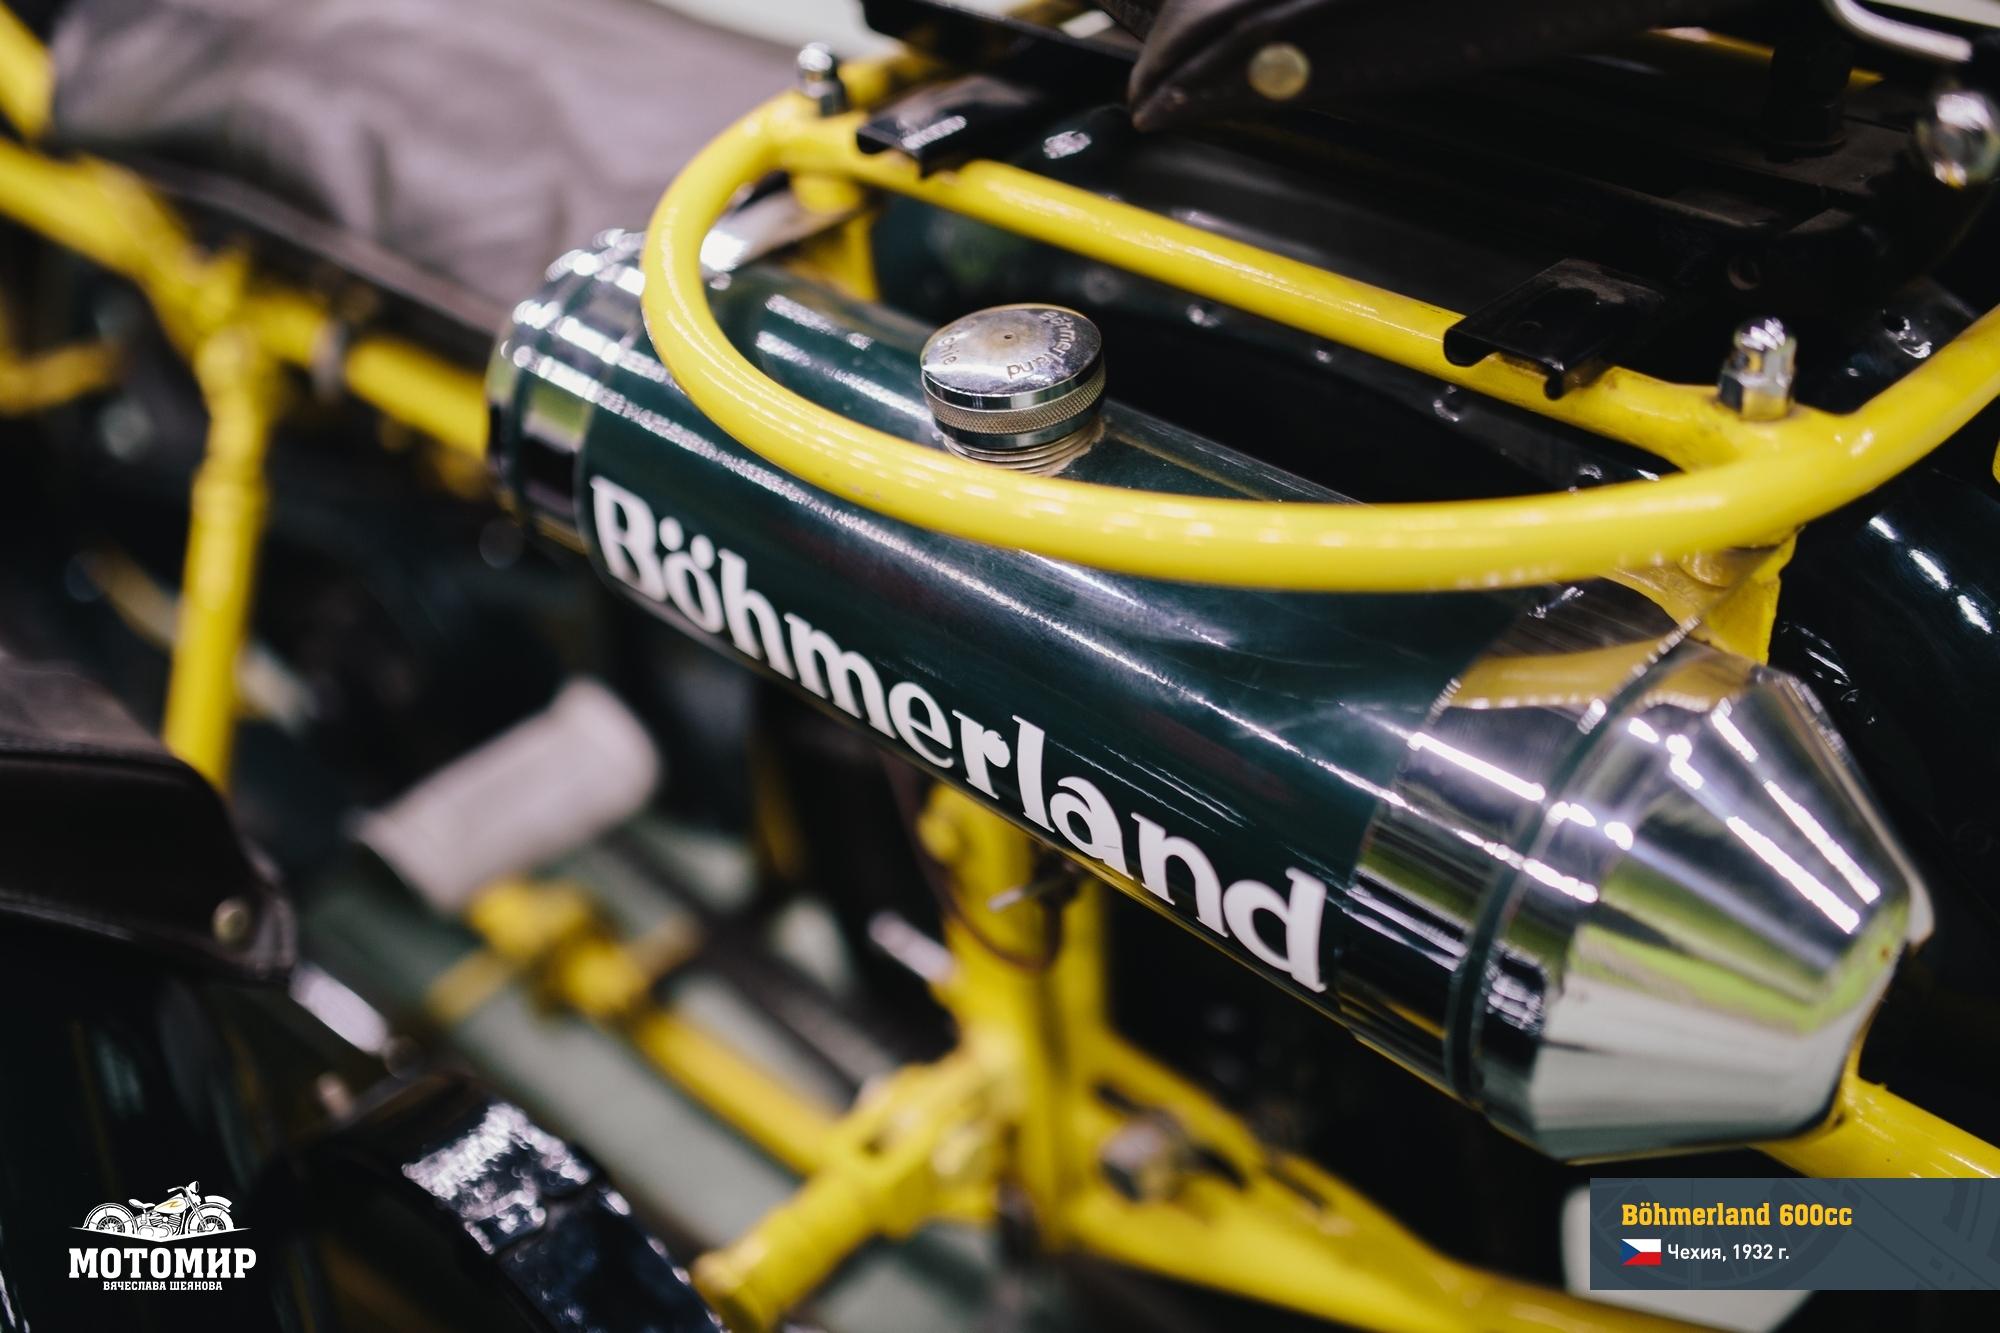 bohmerland-600cc-201502-web-17